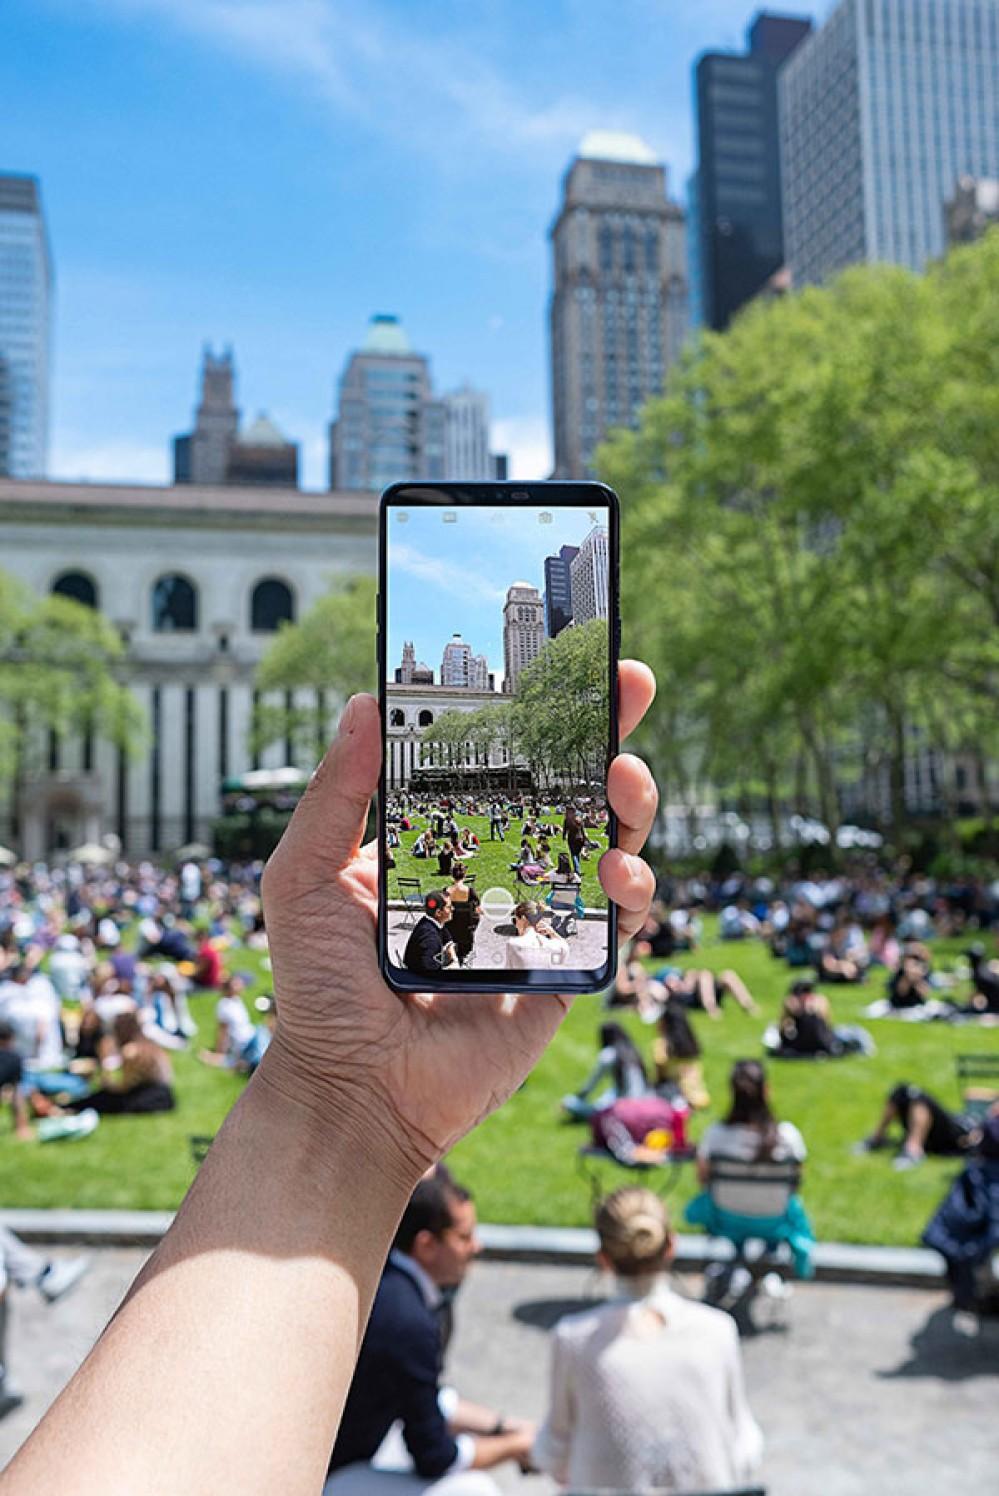 LG G7 ThinQ: Ξεκινά το παγκόσμιο λανσάρισμα της συσκευής